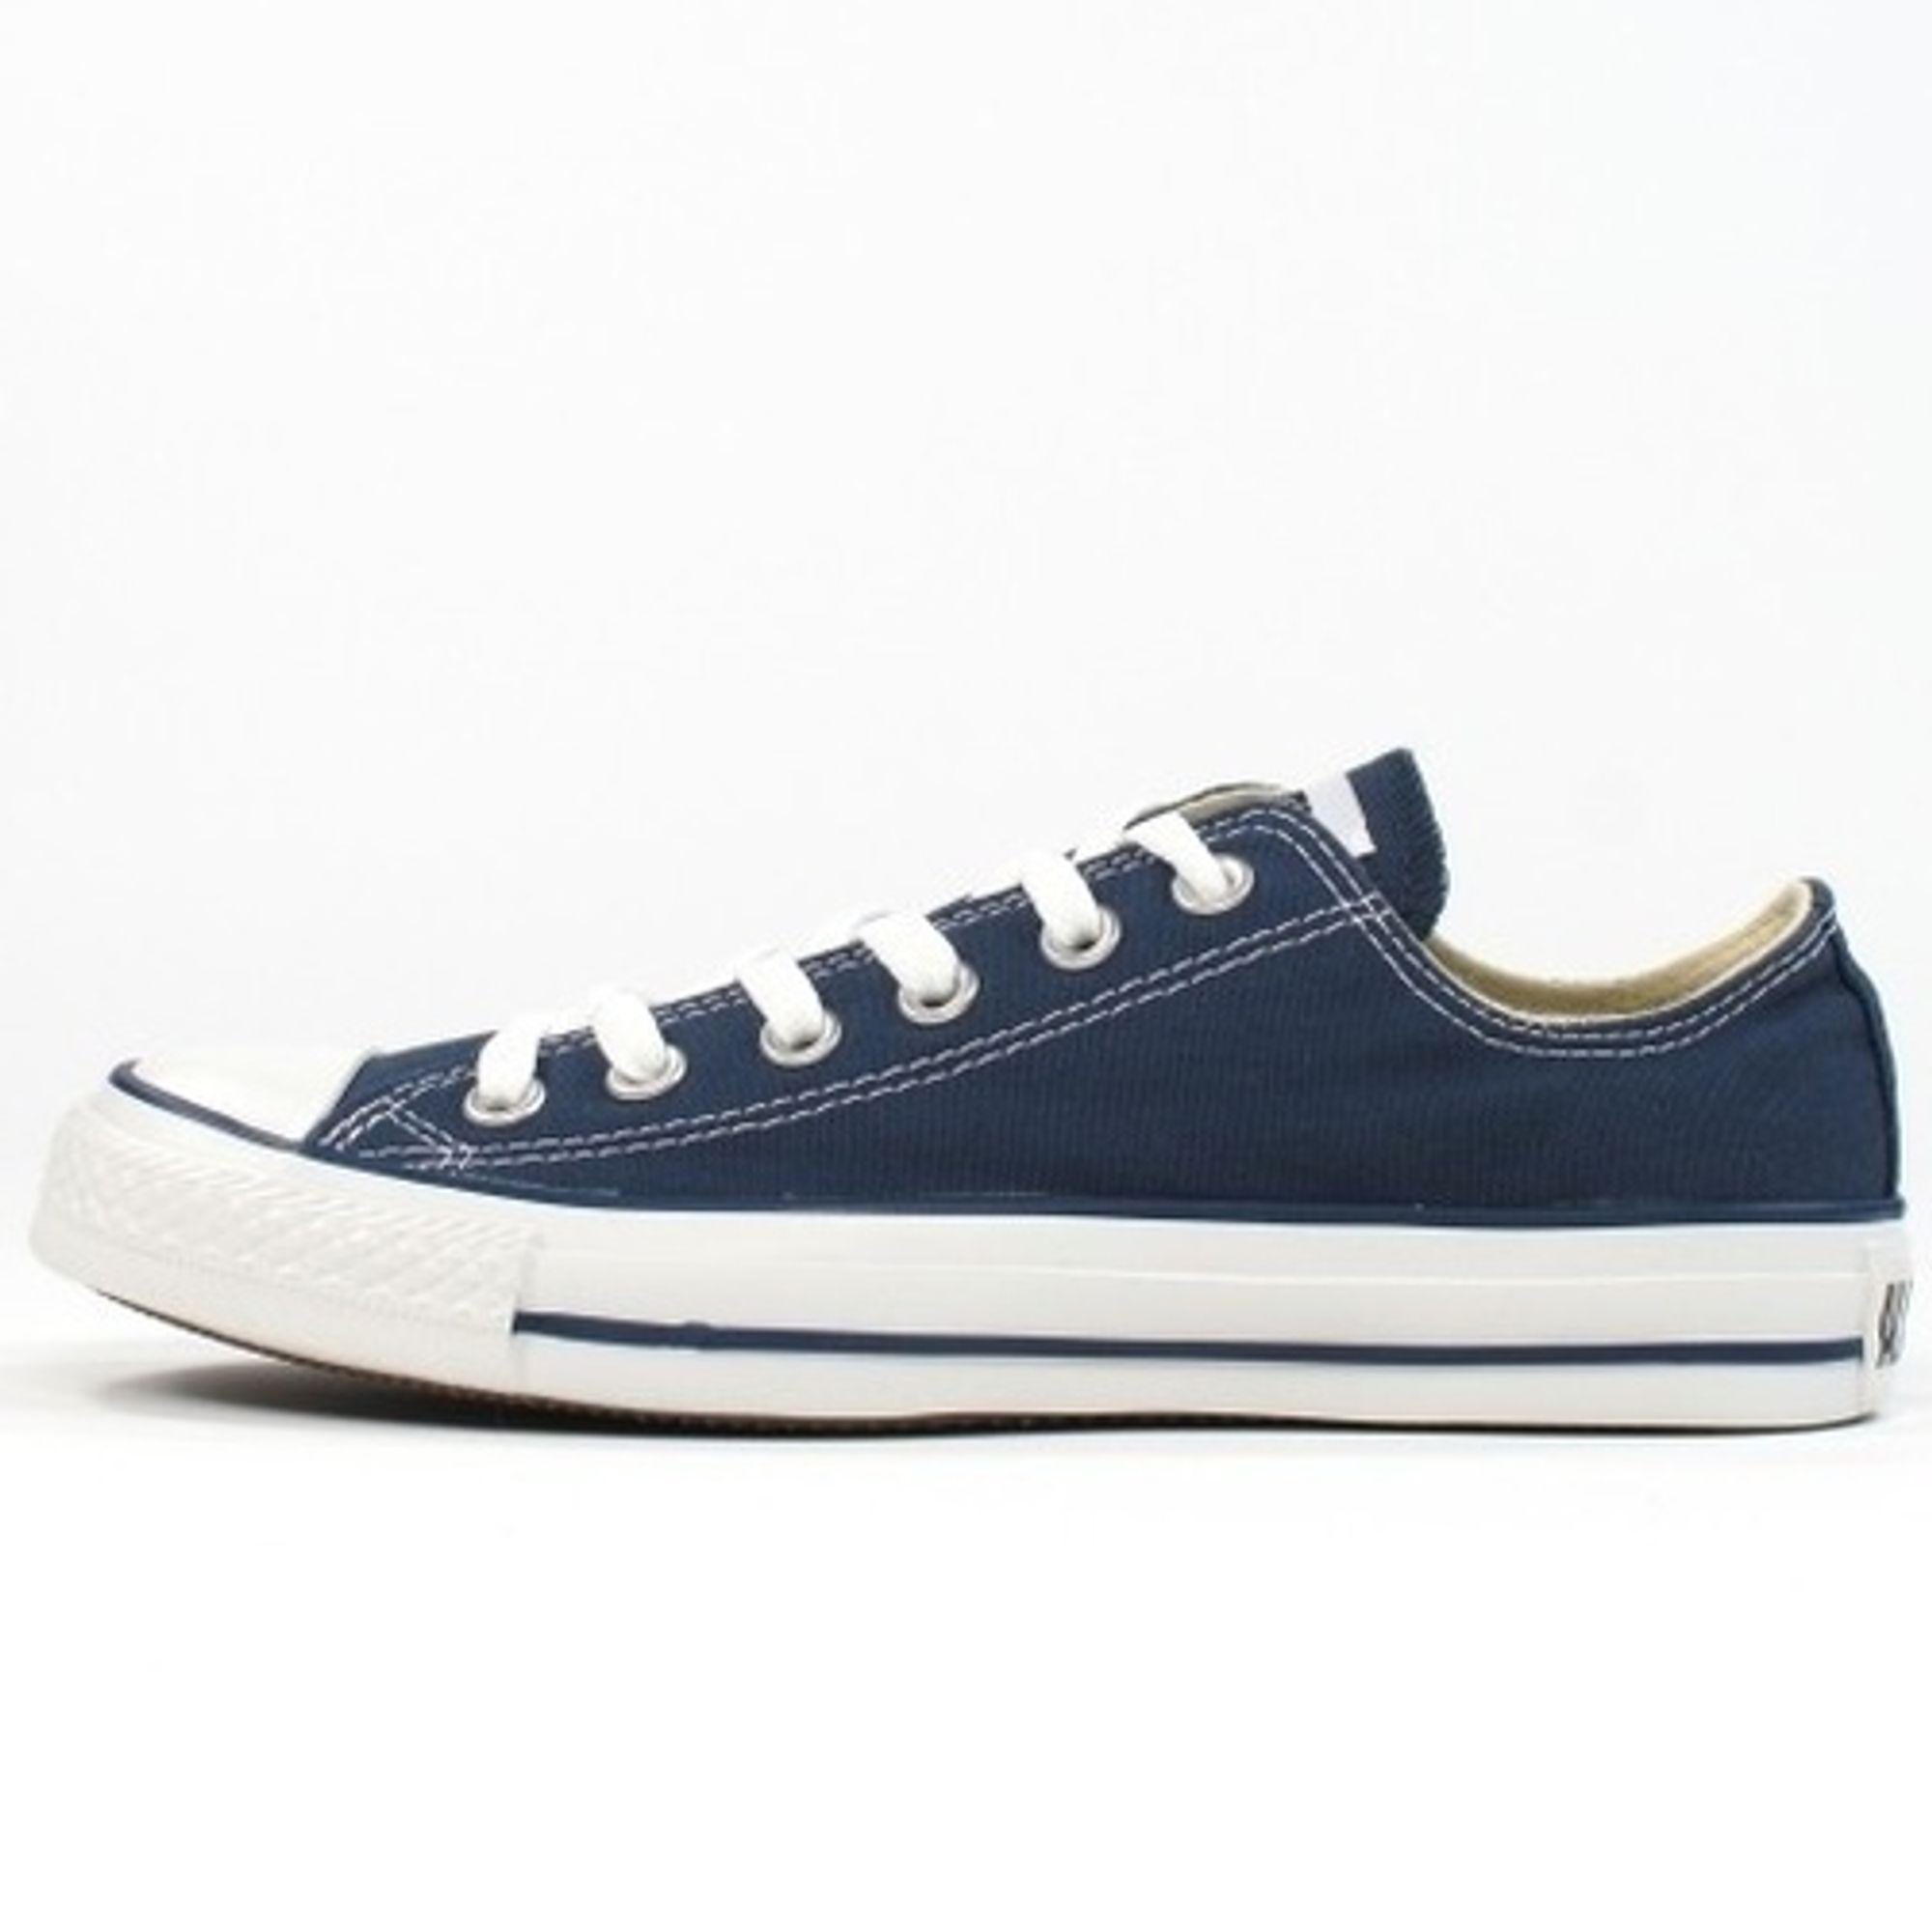 Converse Herren Schuhe All Star Ox Blau M9697C Turnschuhe Blau Gr. 44 Navy